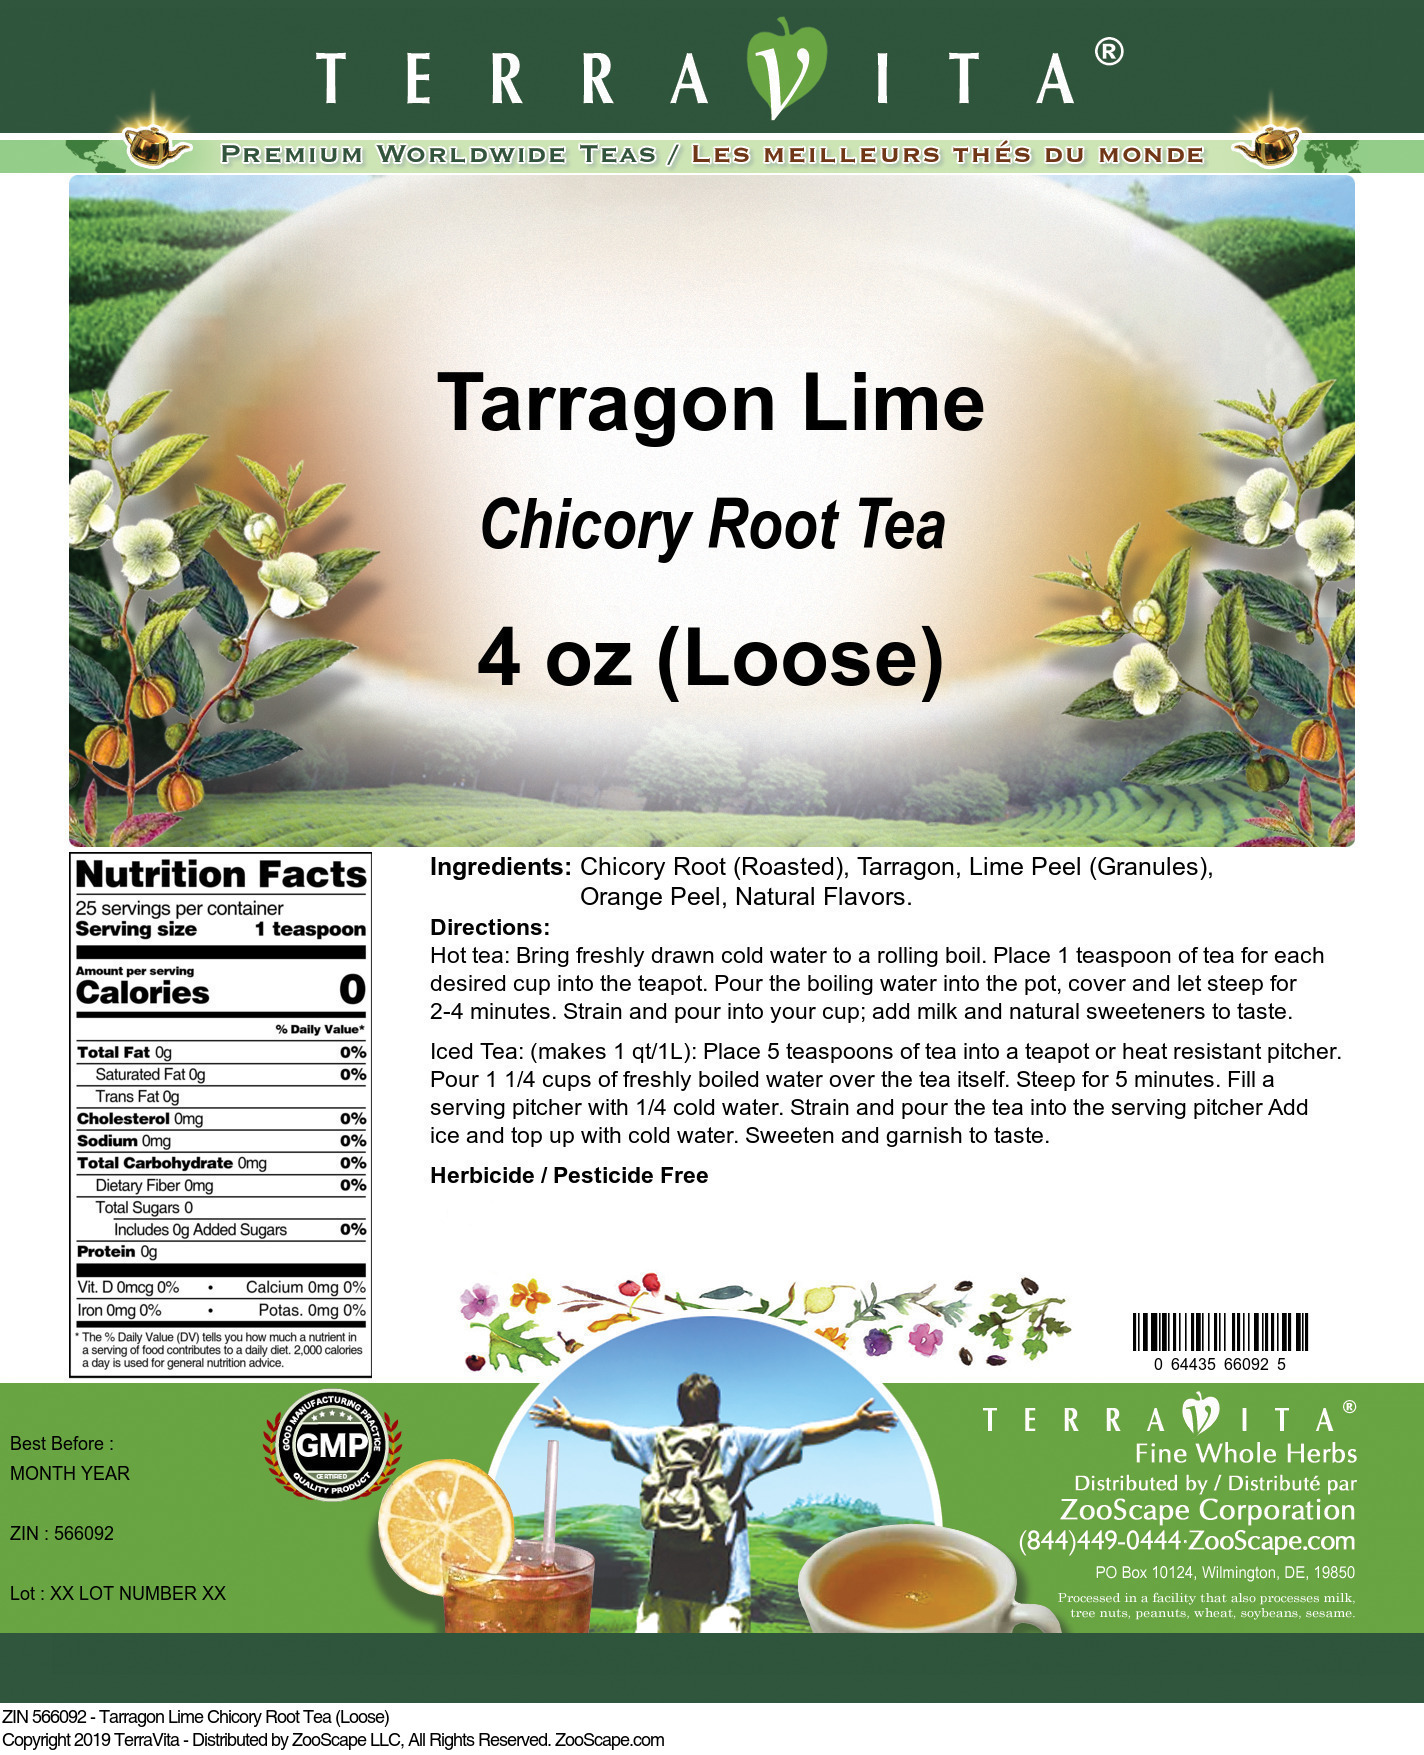 Tarragon Lime Chicory Root